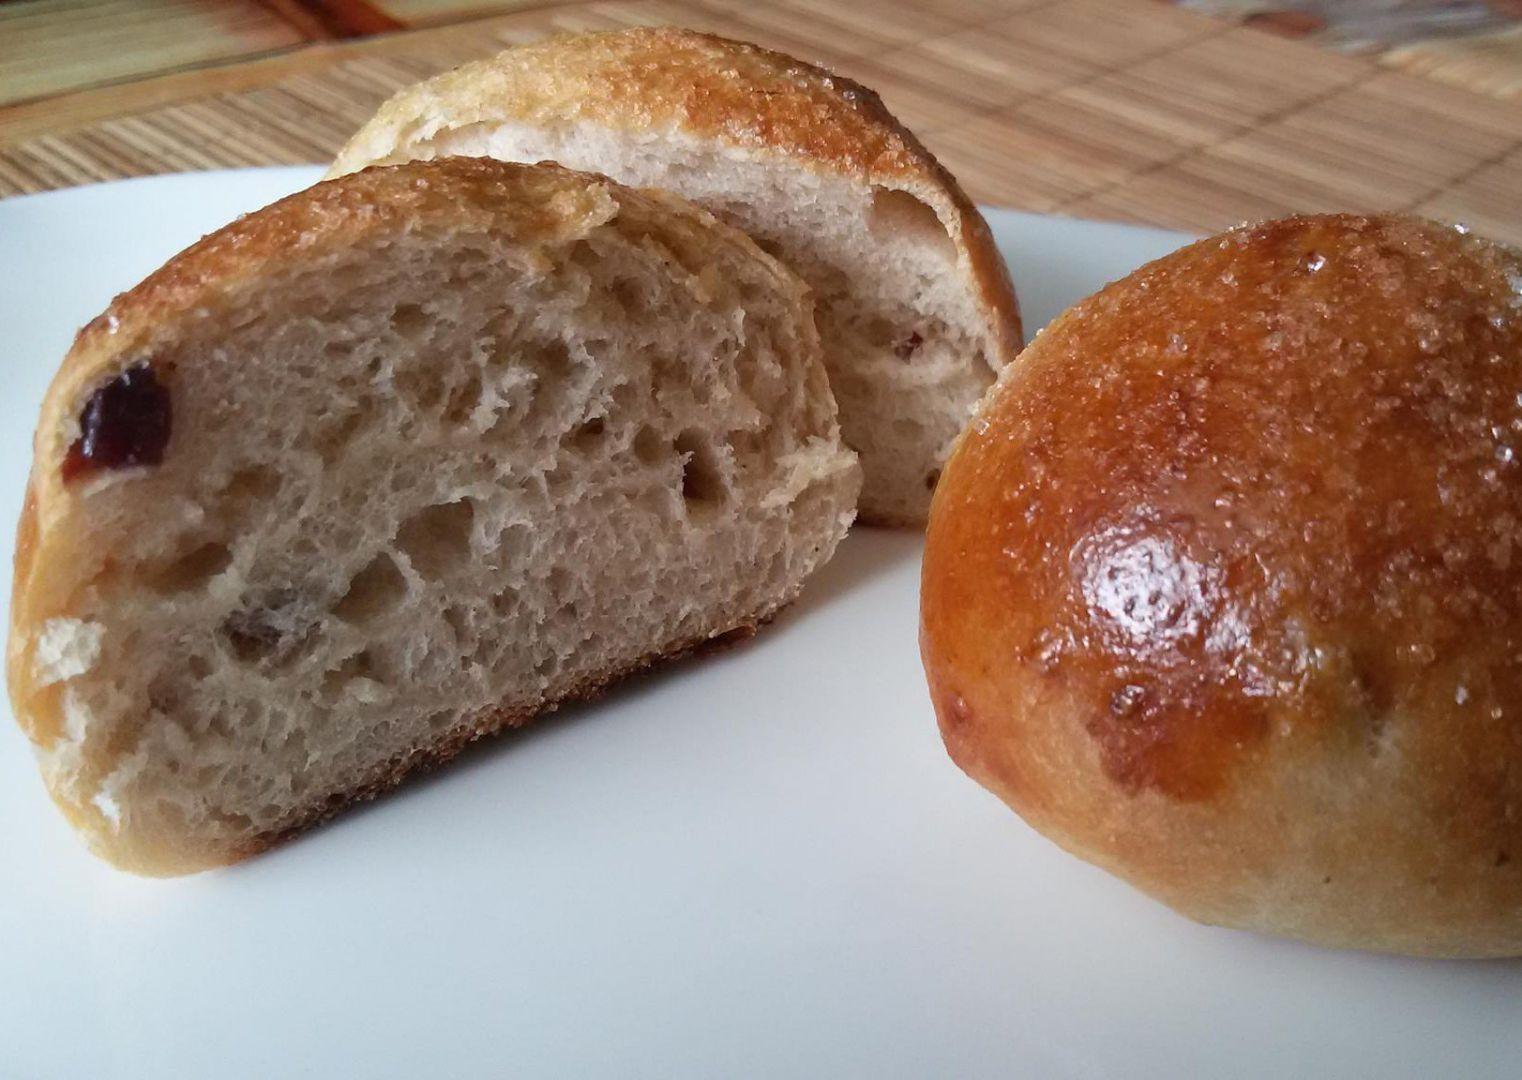 Sladké bulky s brusinkami recept